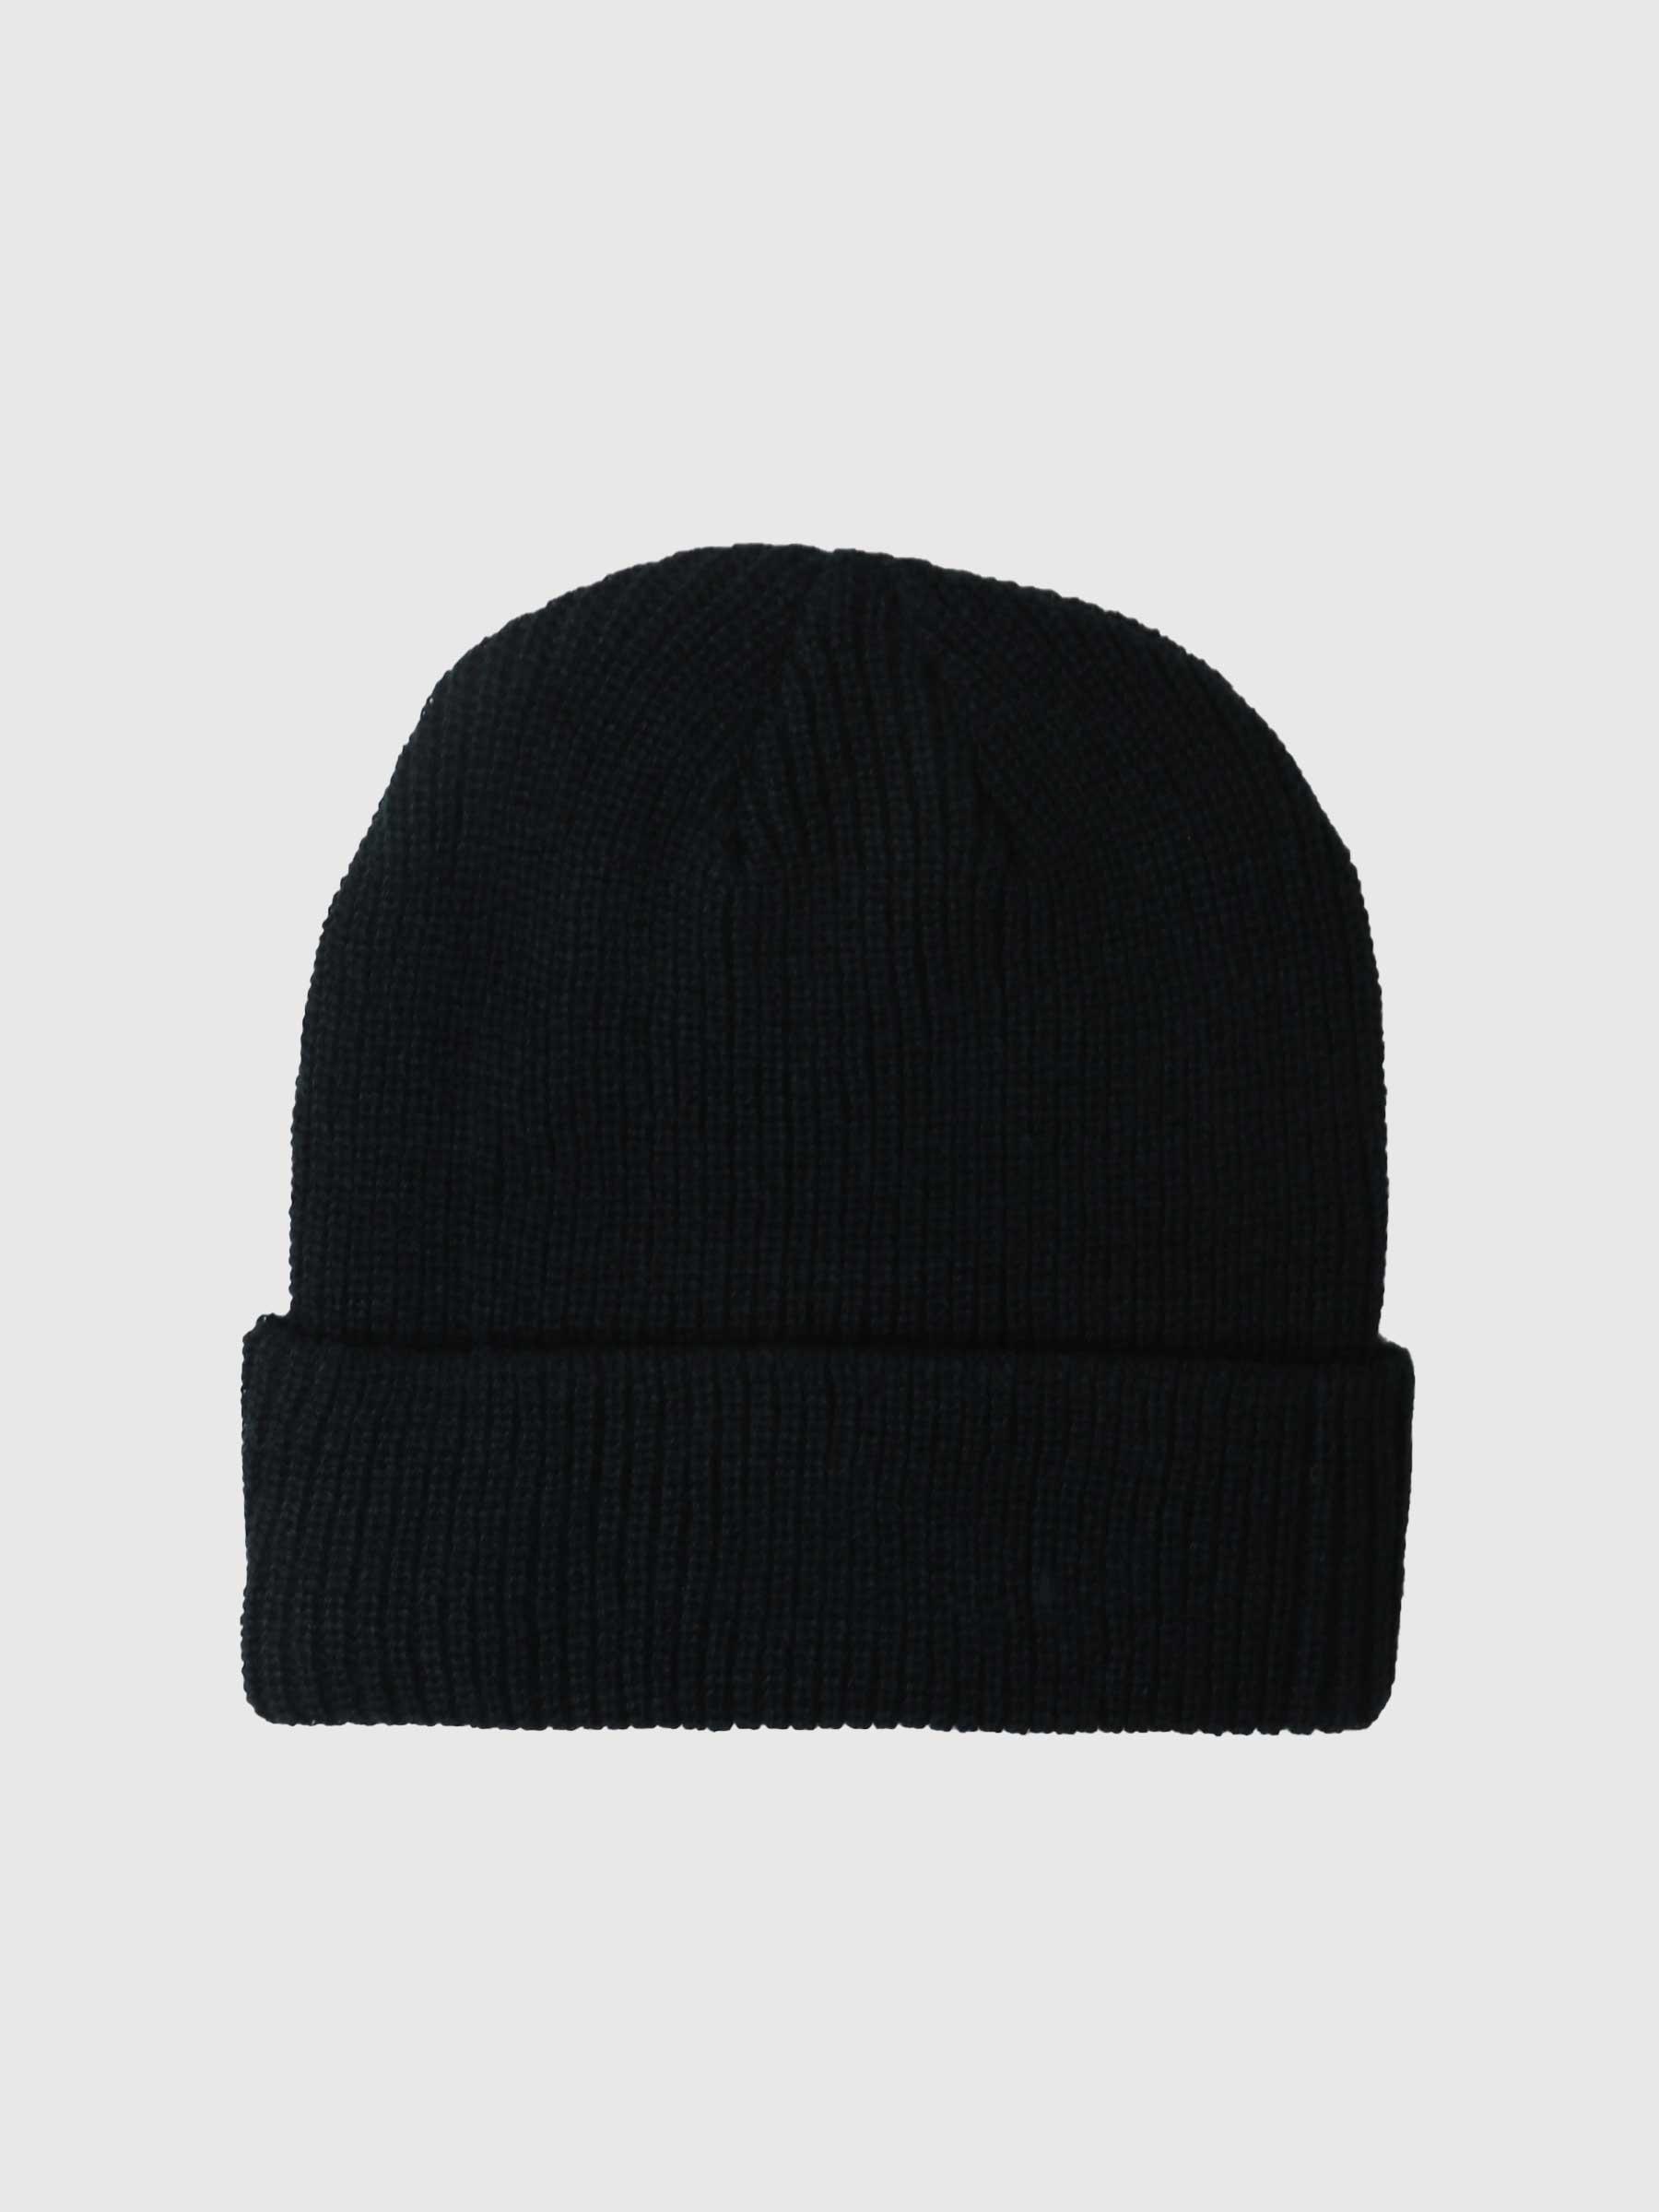 Stussy Basic Cuff Beanie Black 1321019